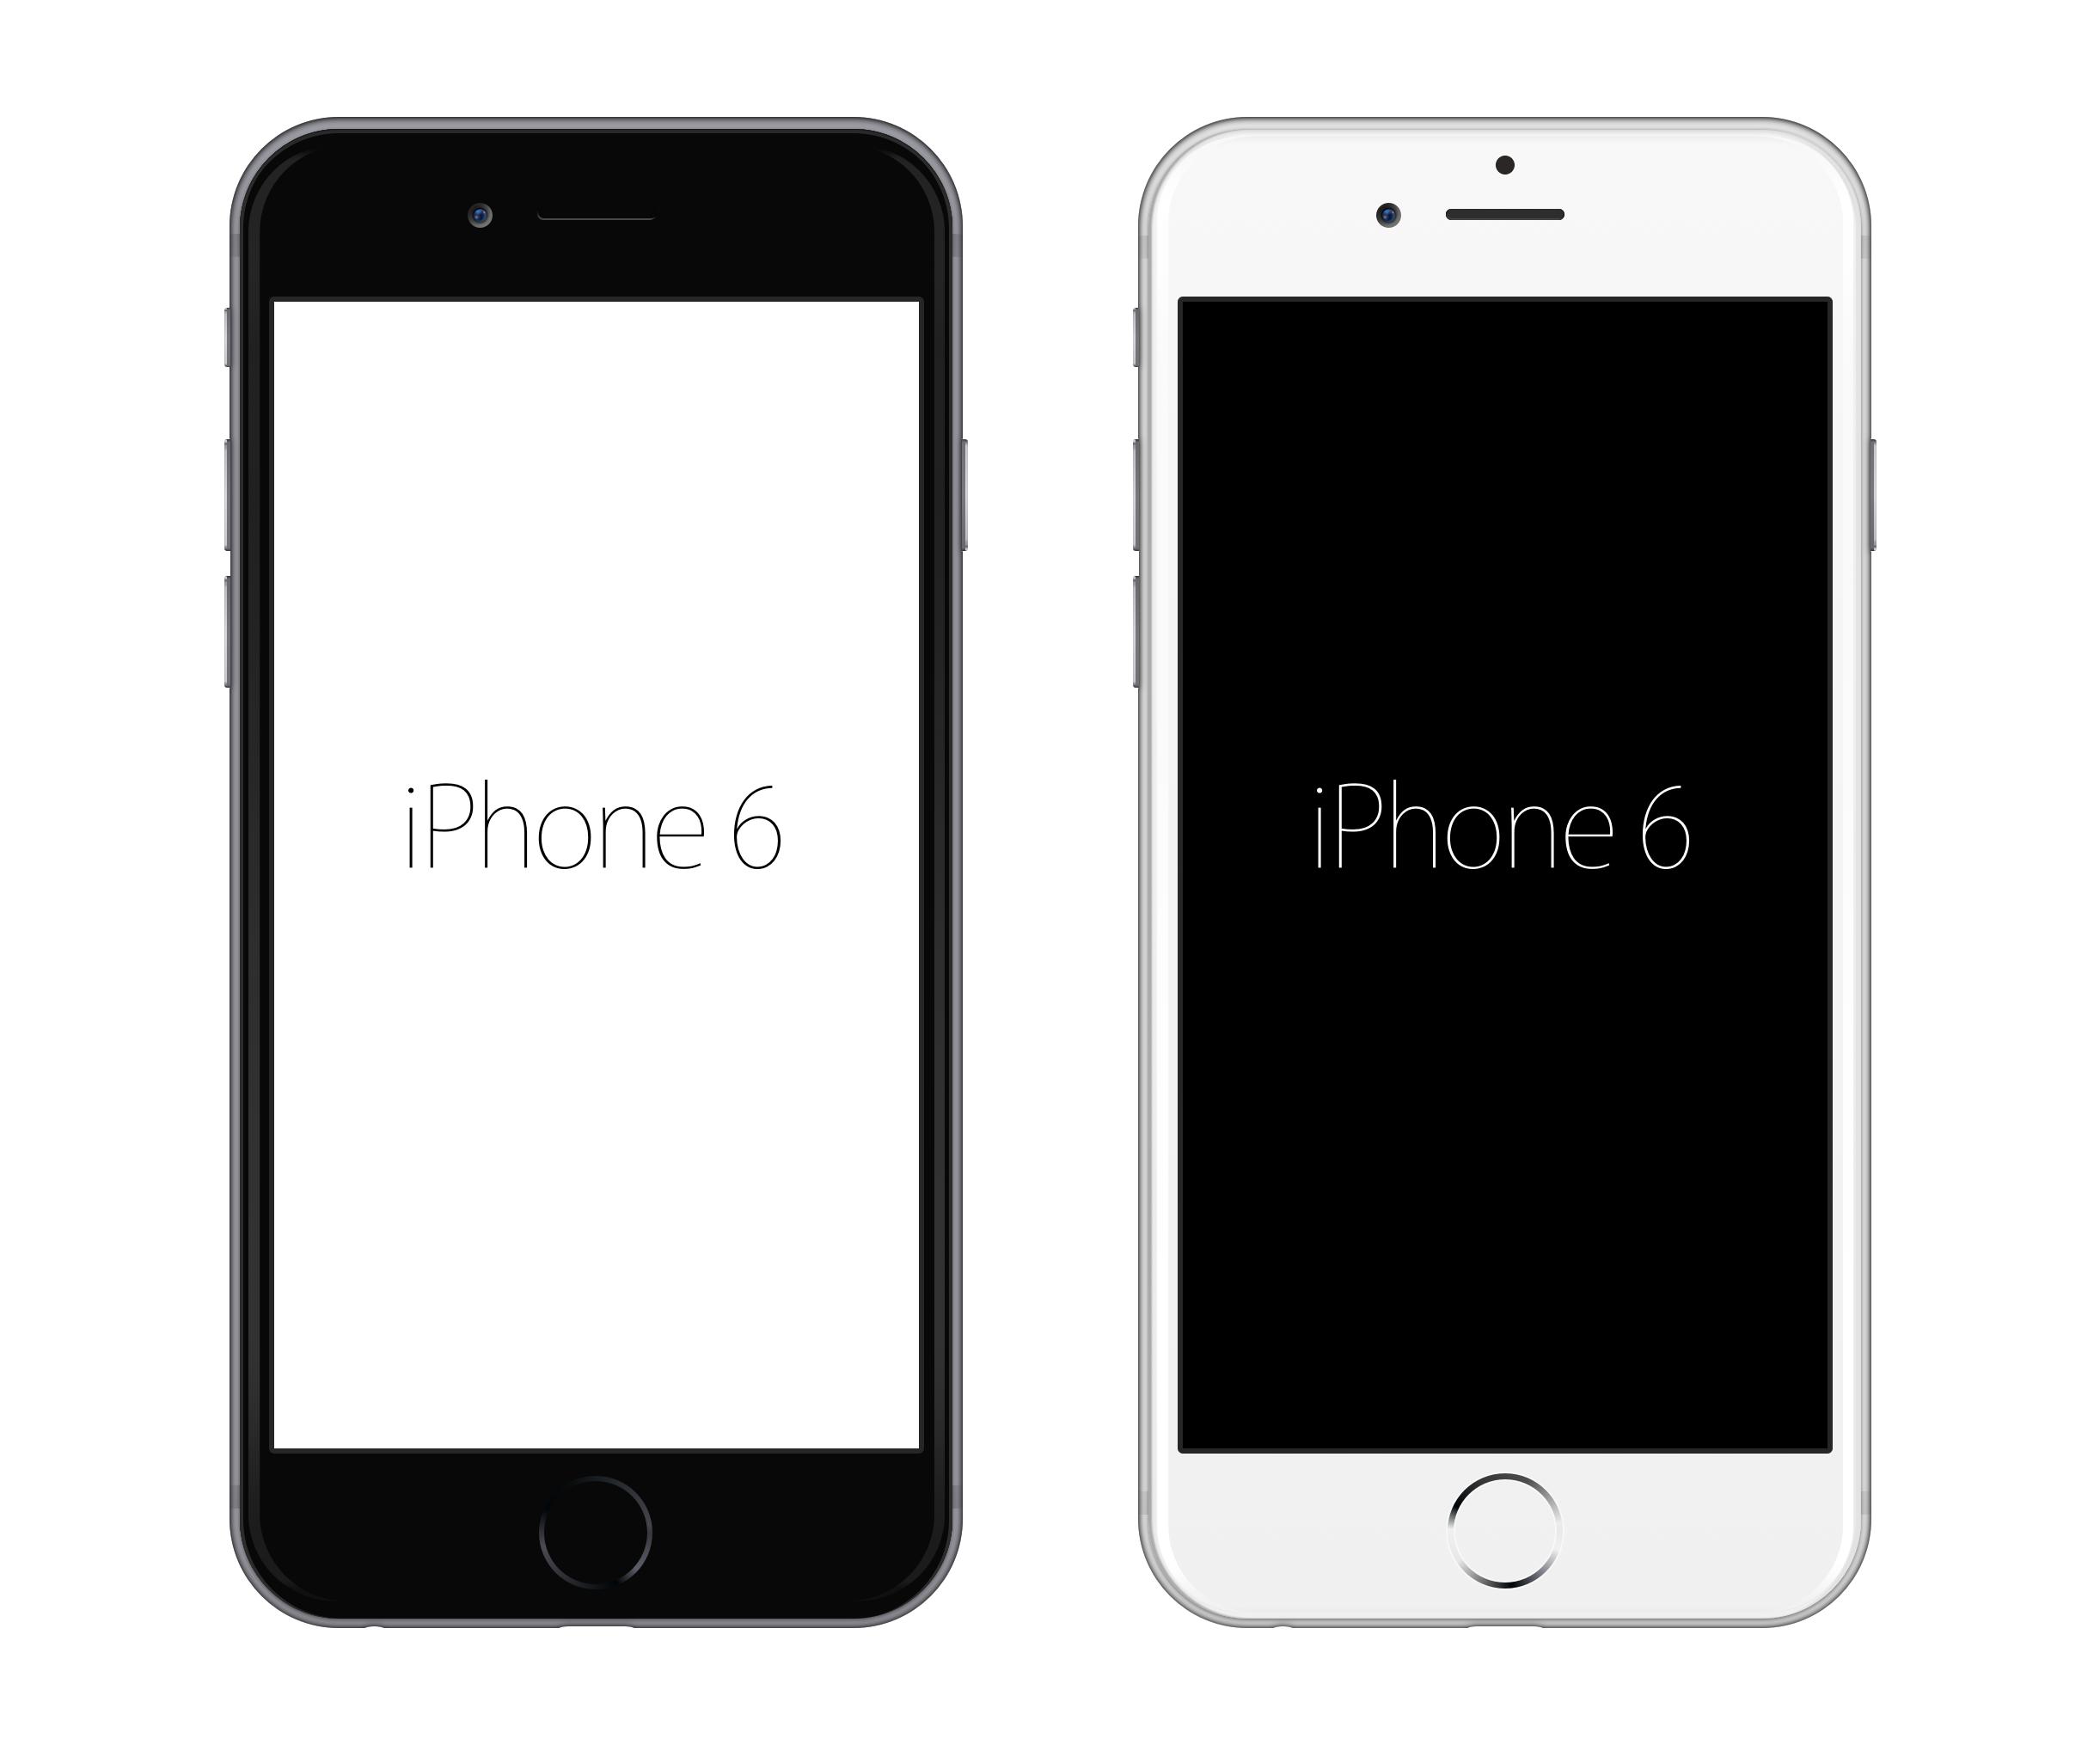 iPhone 6 Sketch Template Iphone, Iphone 6, Iphone 6 screen